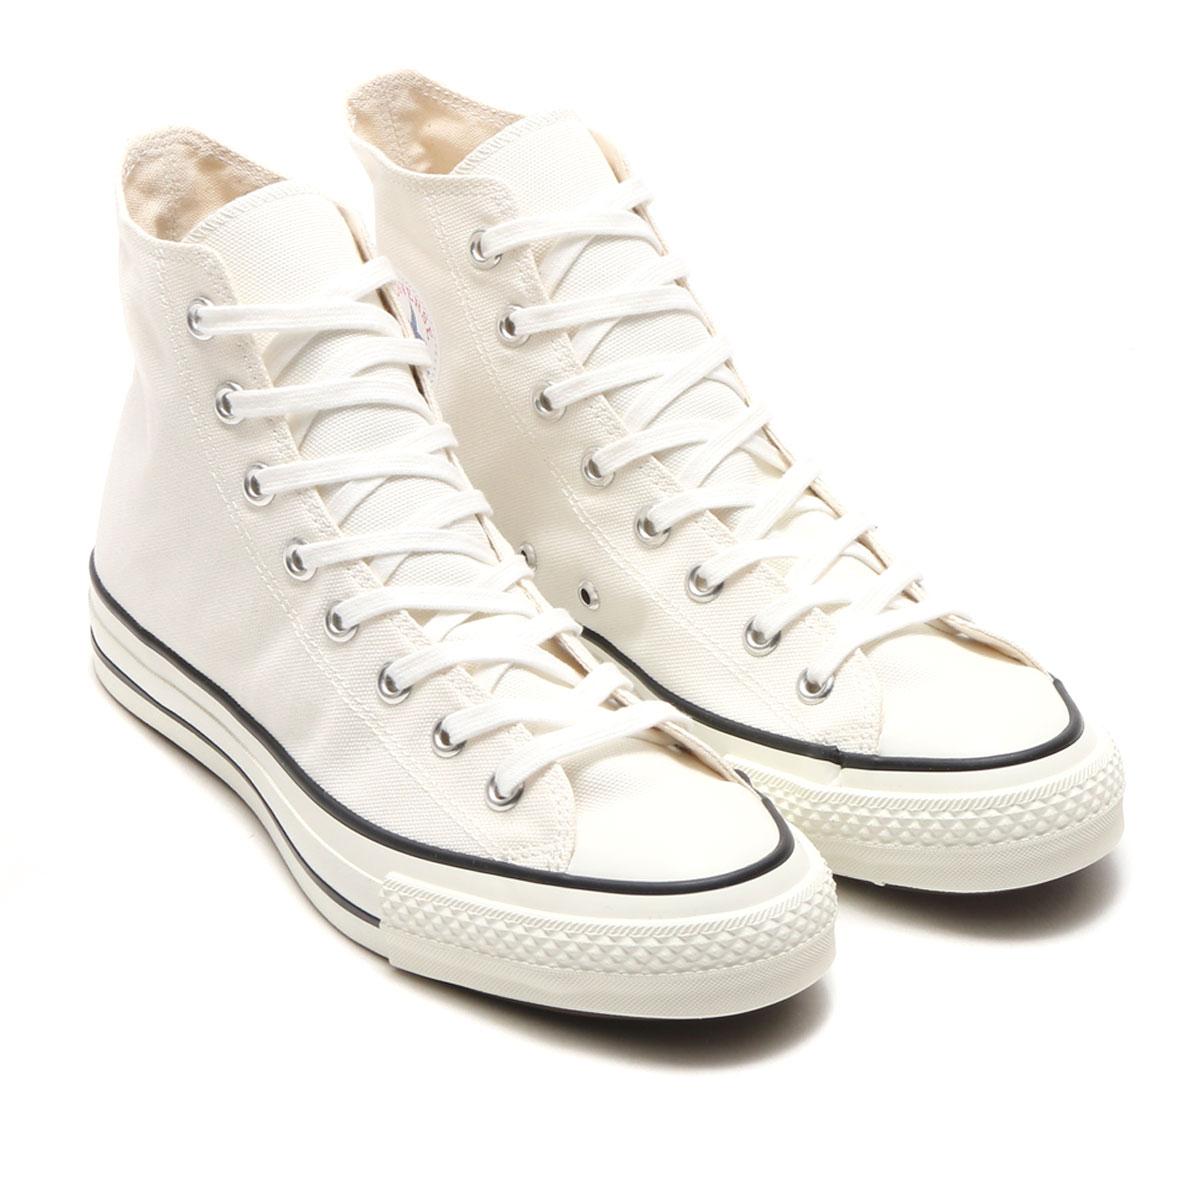 CONVERSE ALL STAR J HI(コンバース オールスター J ハイ)WHITE【メンズ レディース スニーカー】17FW-I